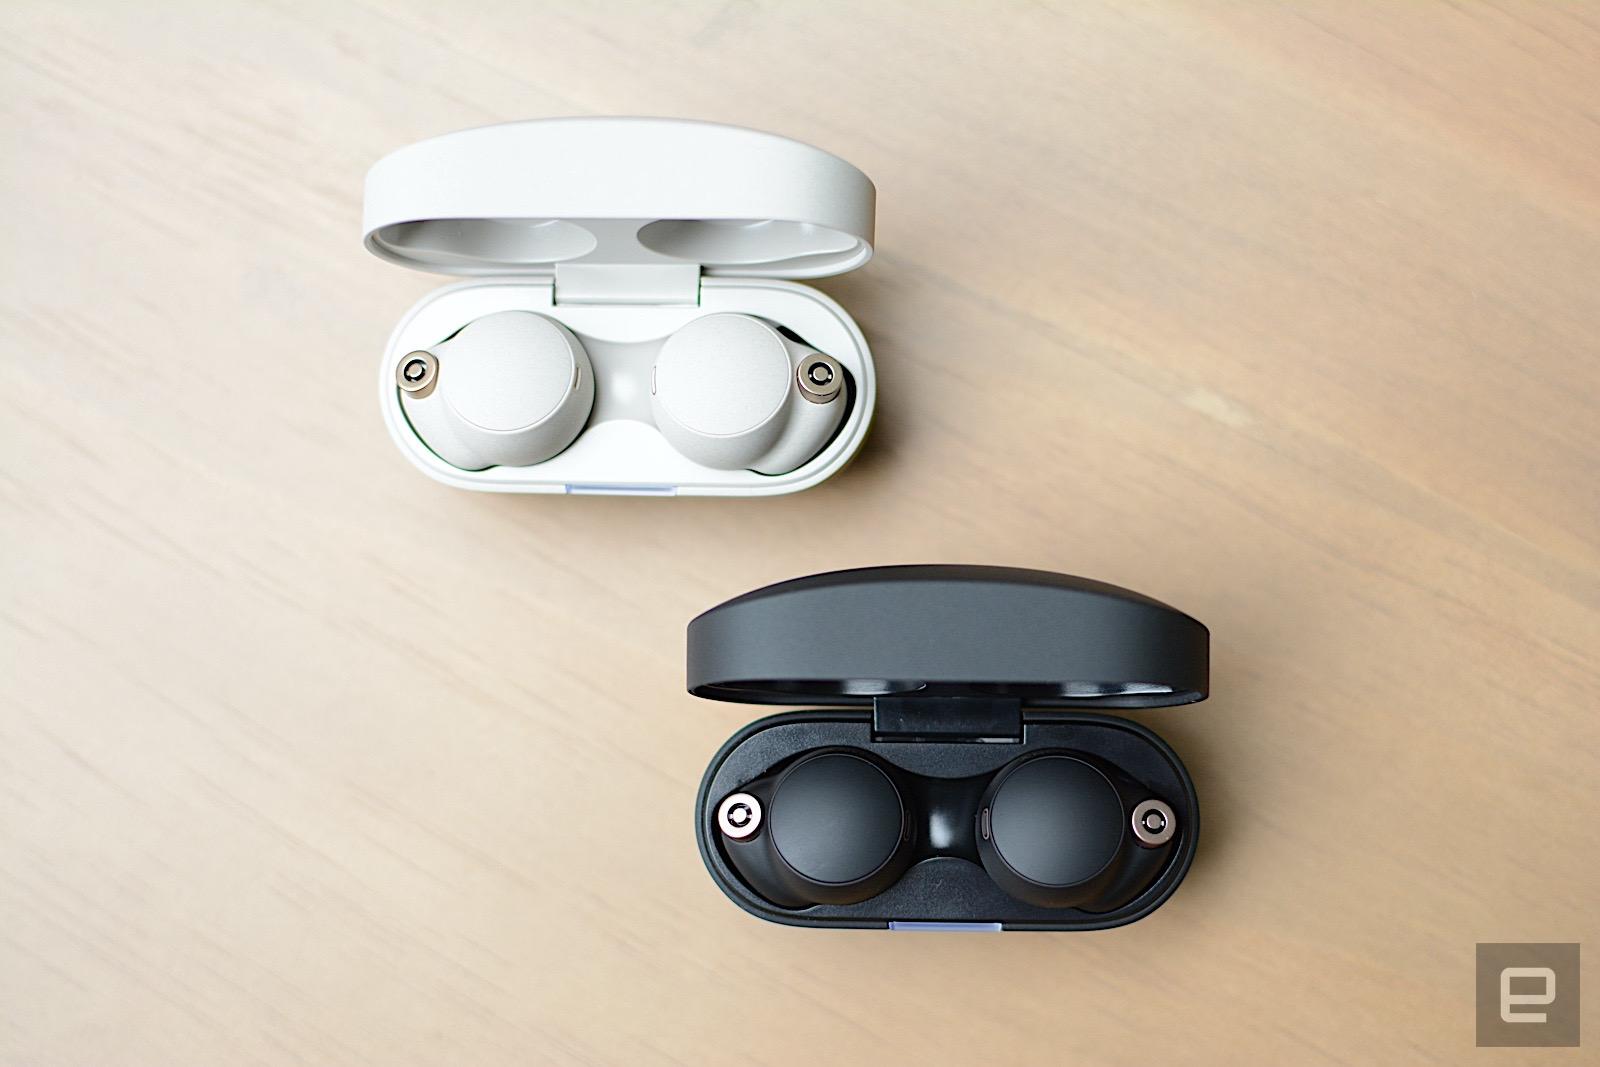 ICYMI: We take a listen to Sony's new WF-1000XM4 earbuds | Engadget